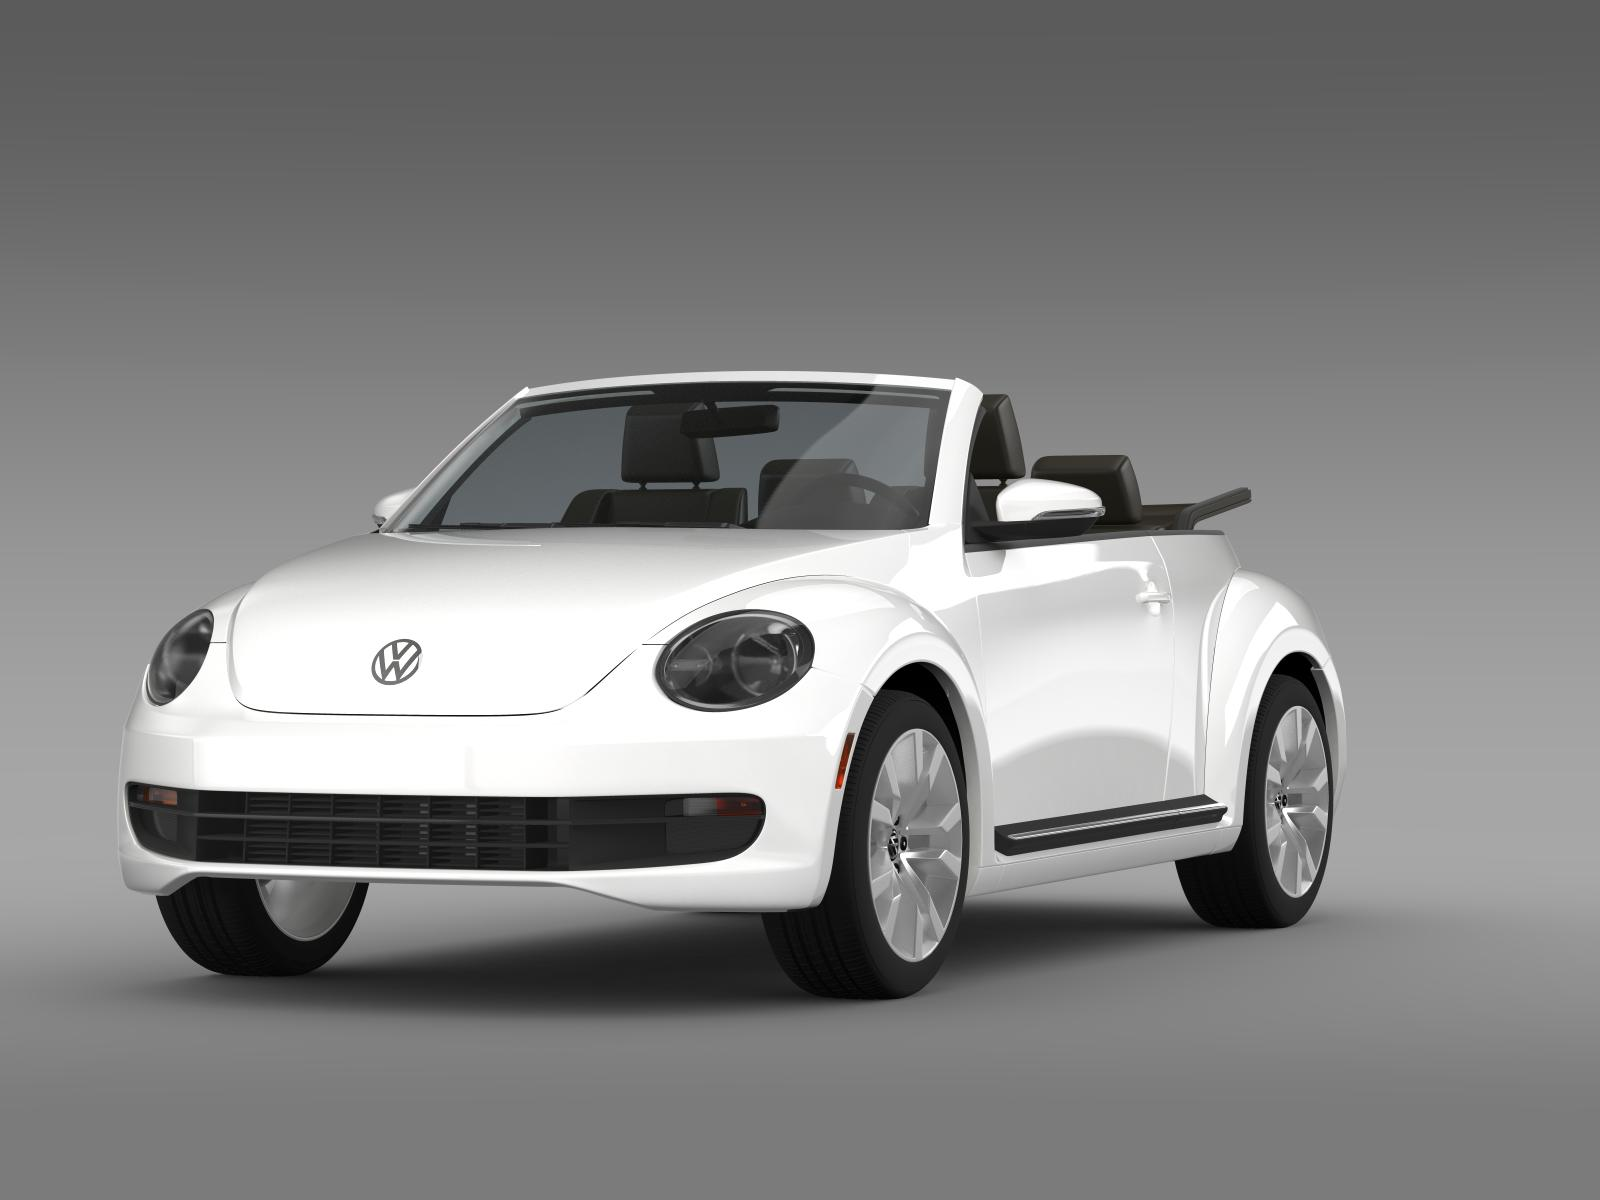 vw beetle tdi cabrio 2014 3d model flatpyramid. Black Bedroom Furniture Sets. Home Design Ideas